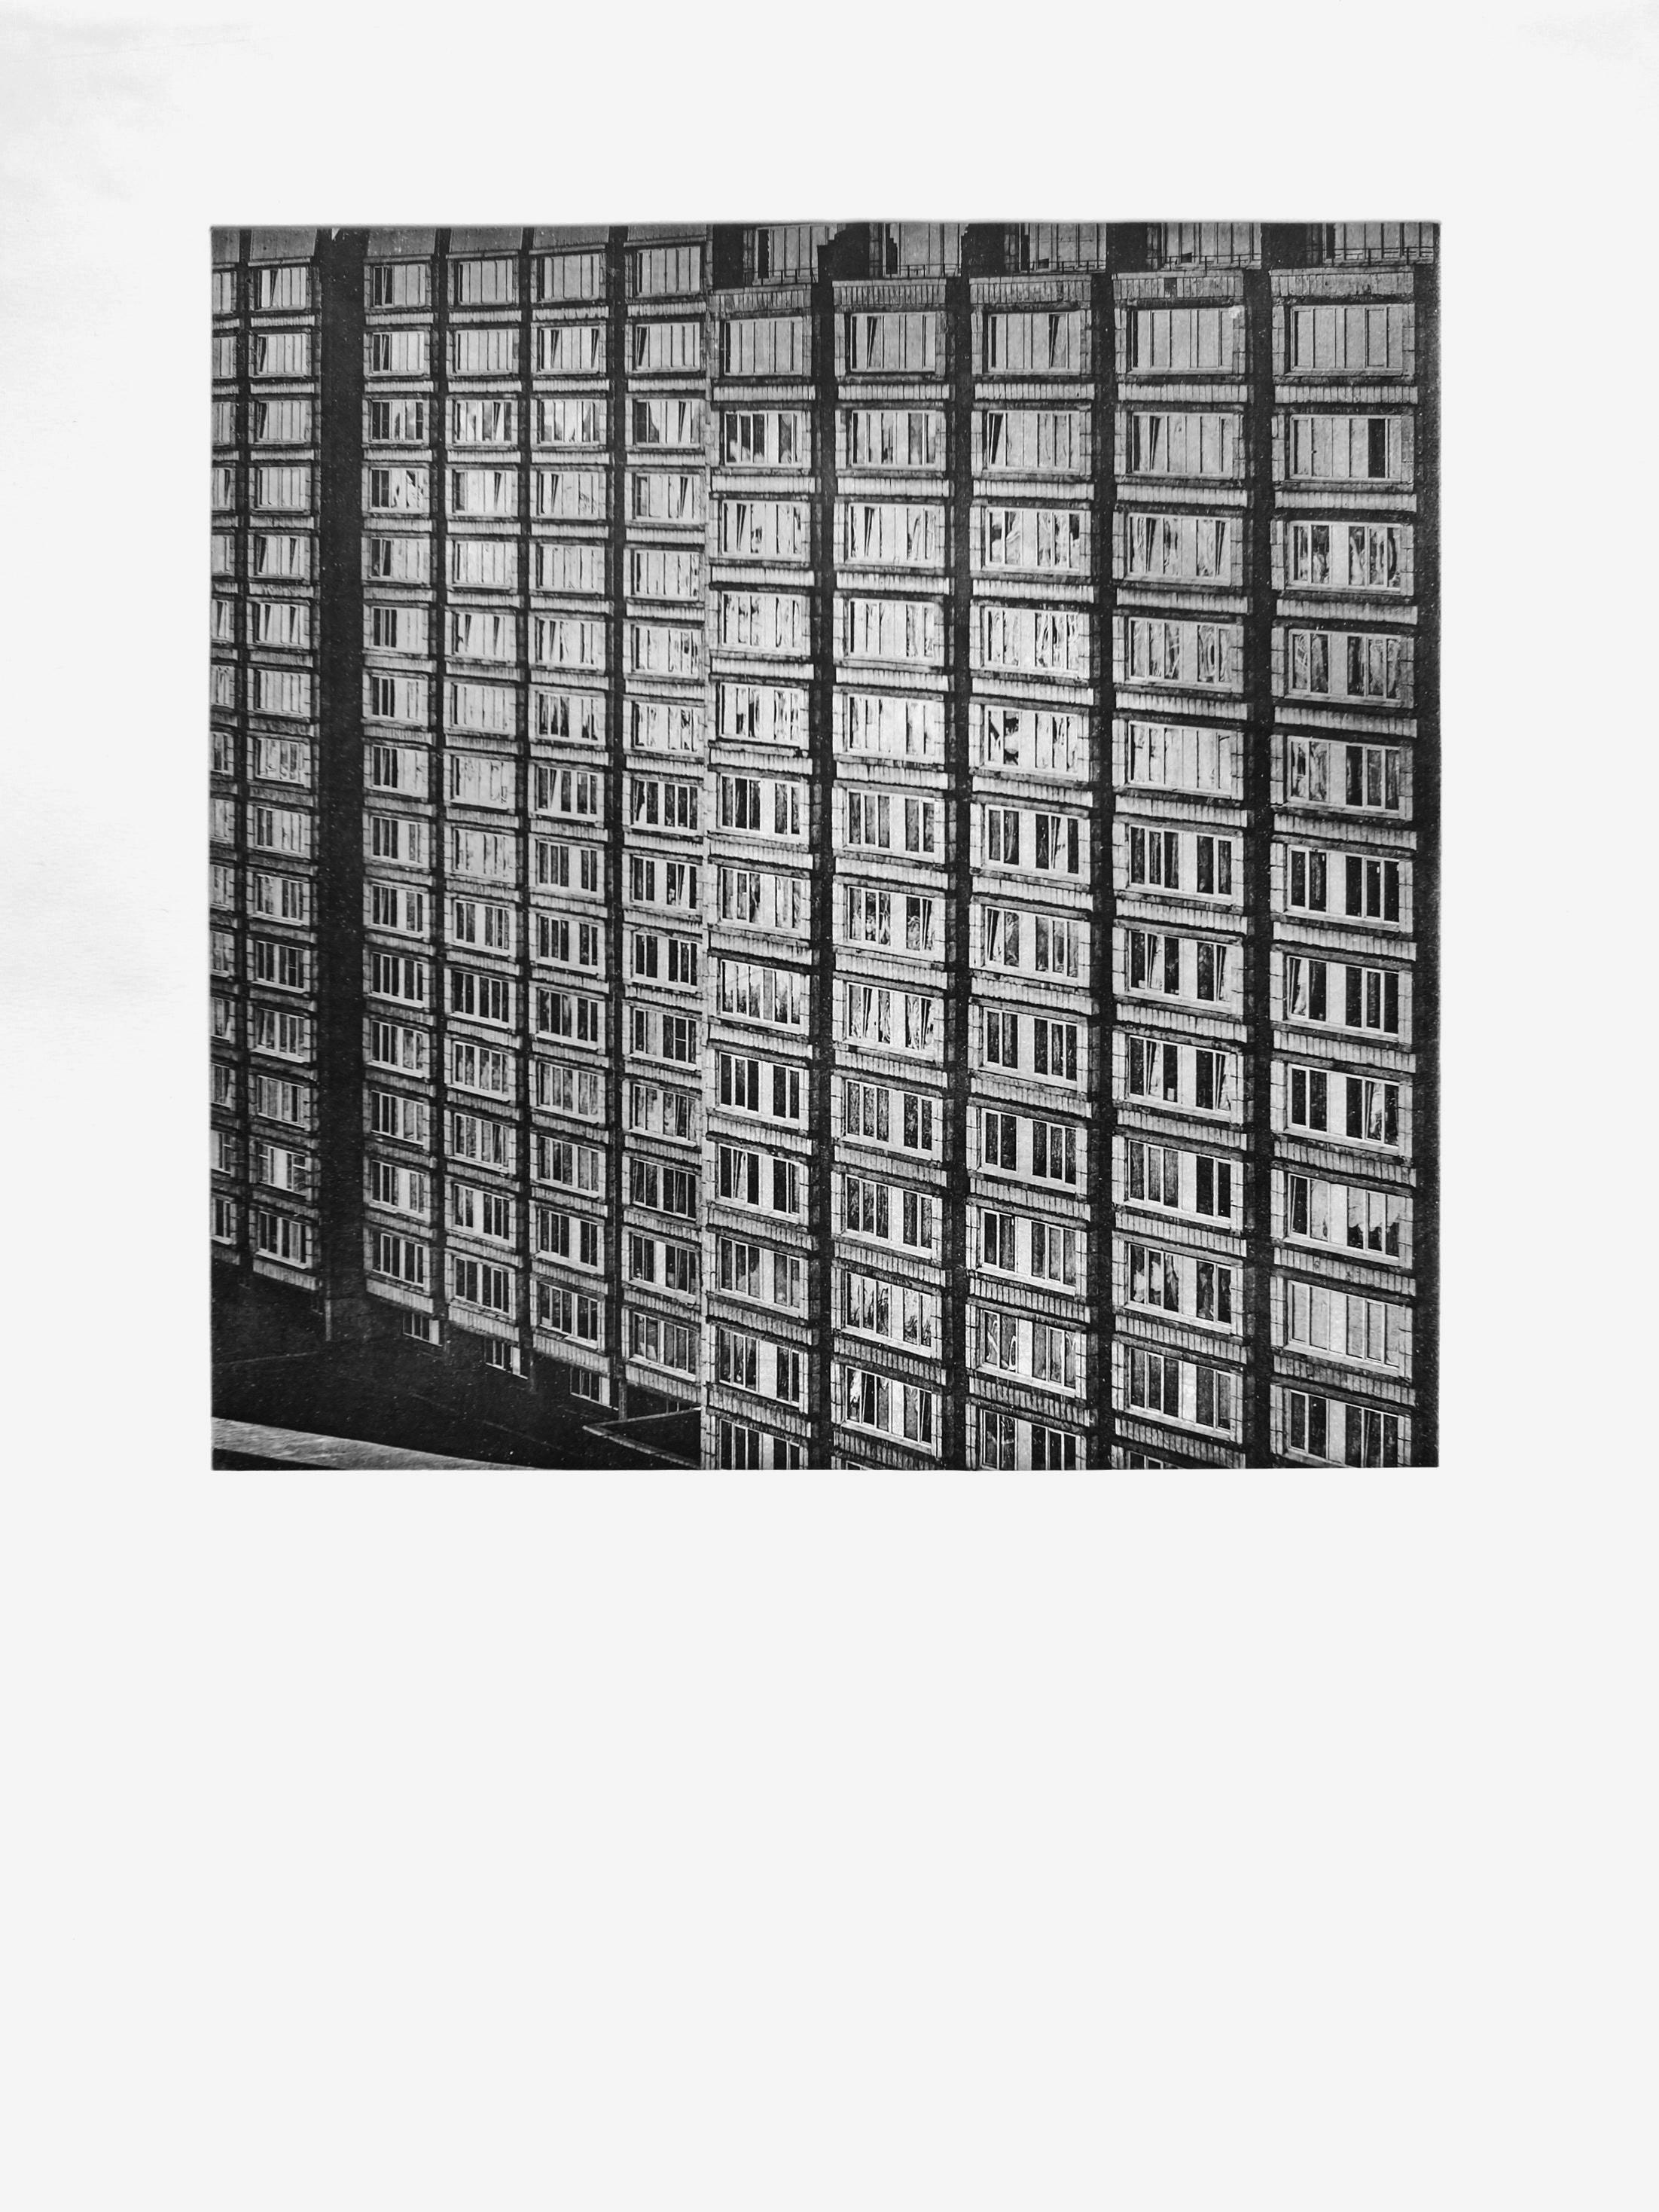 Der Bau ii (2017)  medium: Heliogravüre  size: 60 x 80 cm  paper: Zerkall 270 g/qm  plate: 44 x 44 cm  edition: 11 copies  numbered: 1/7 - 7/7, 4 e.a.  printer: FWU